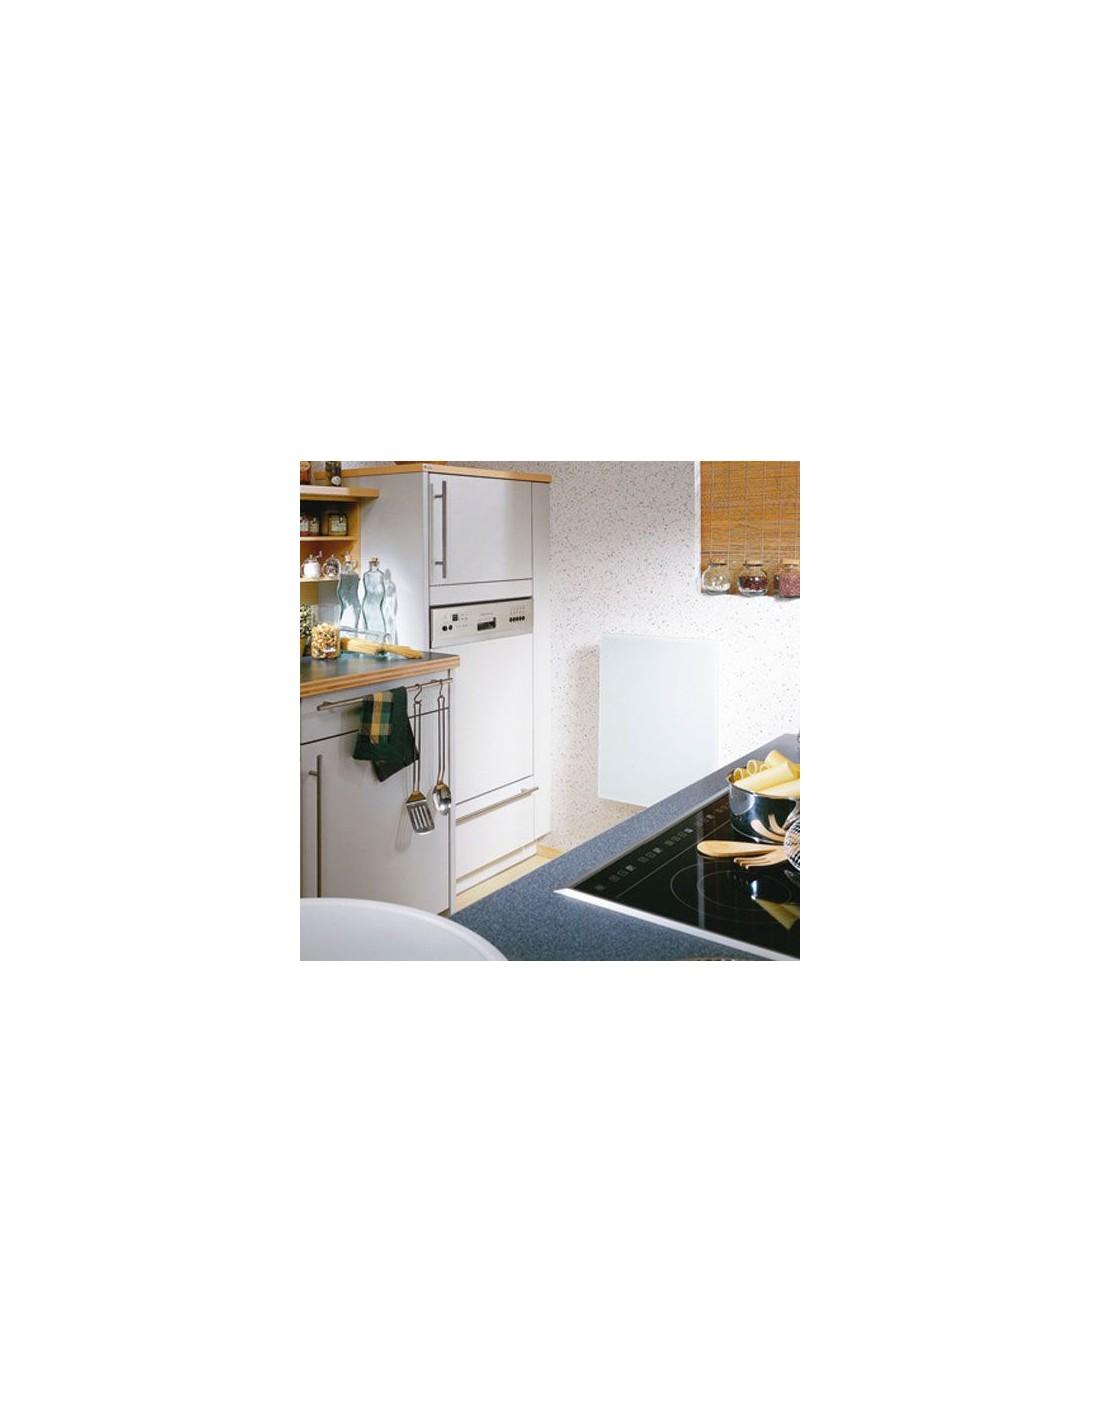 Radiateur Solaris blanc brillant 450W de la marque Fondis - Valente Design